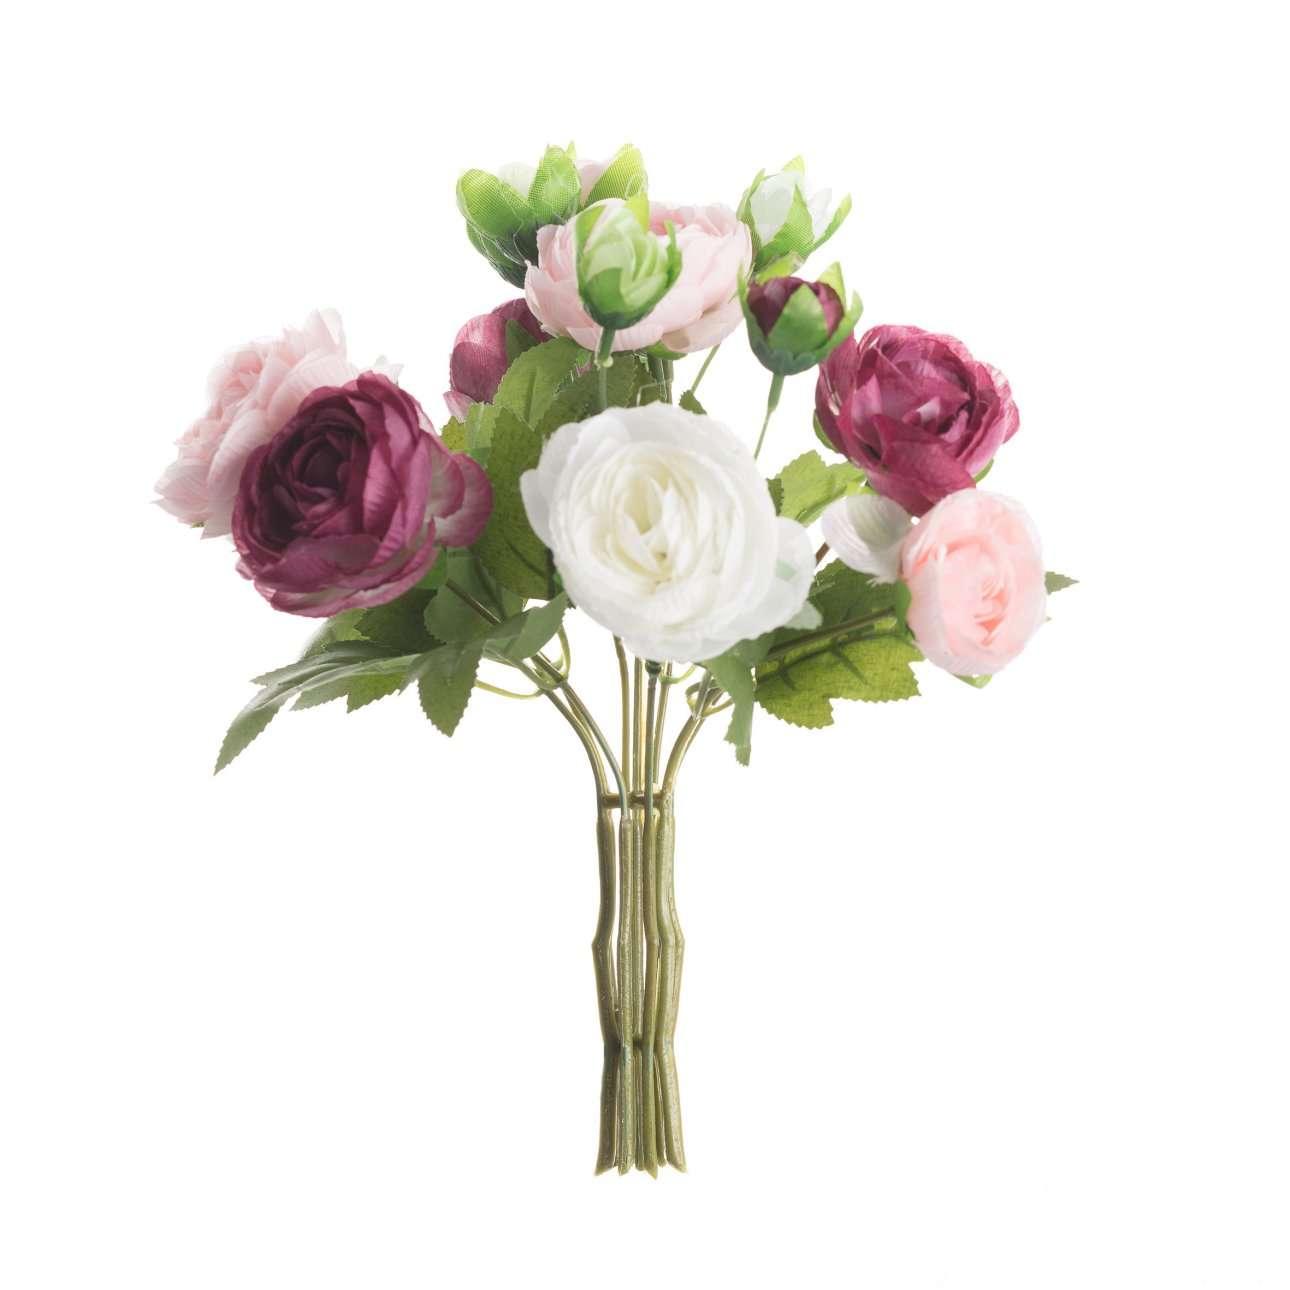 Artificial Mixed Roses Bouquet H 27 cm